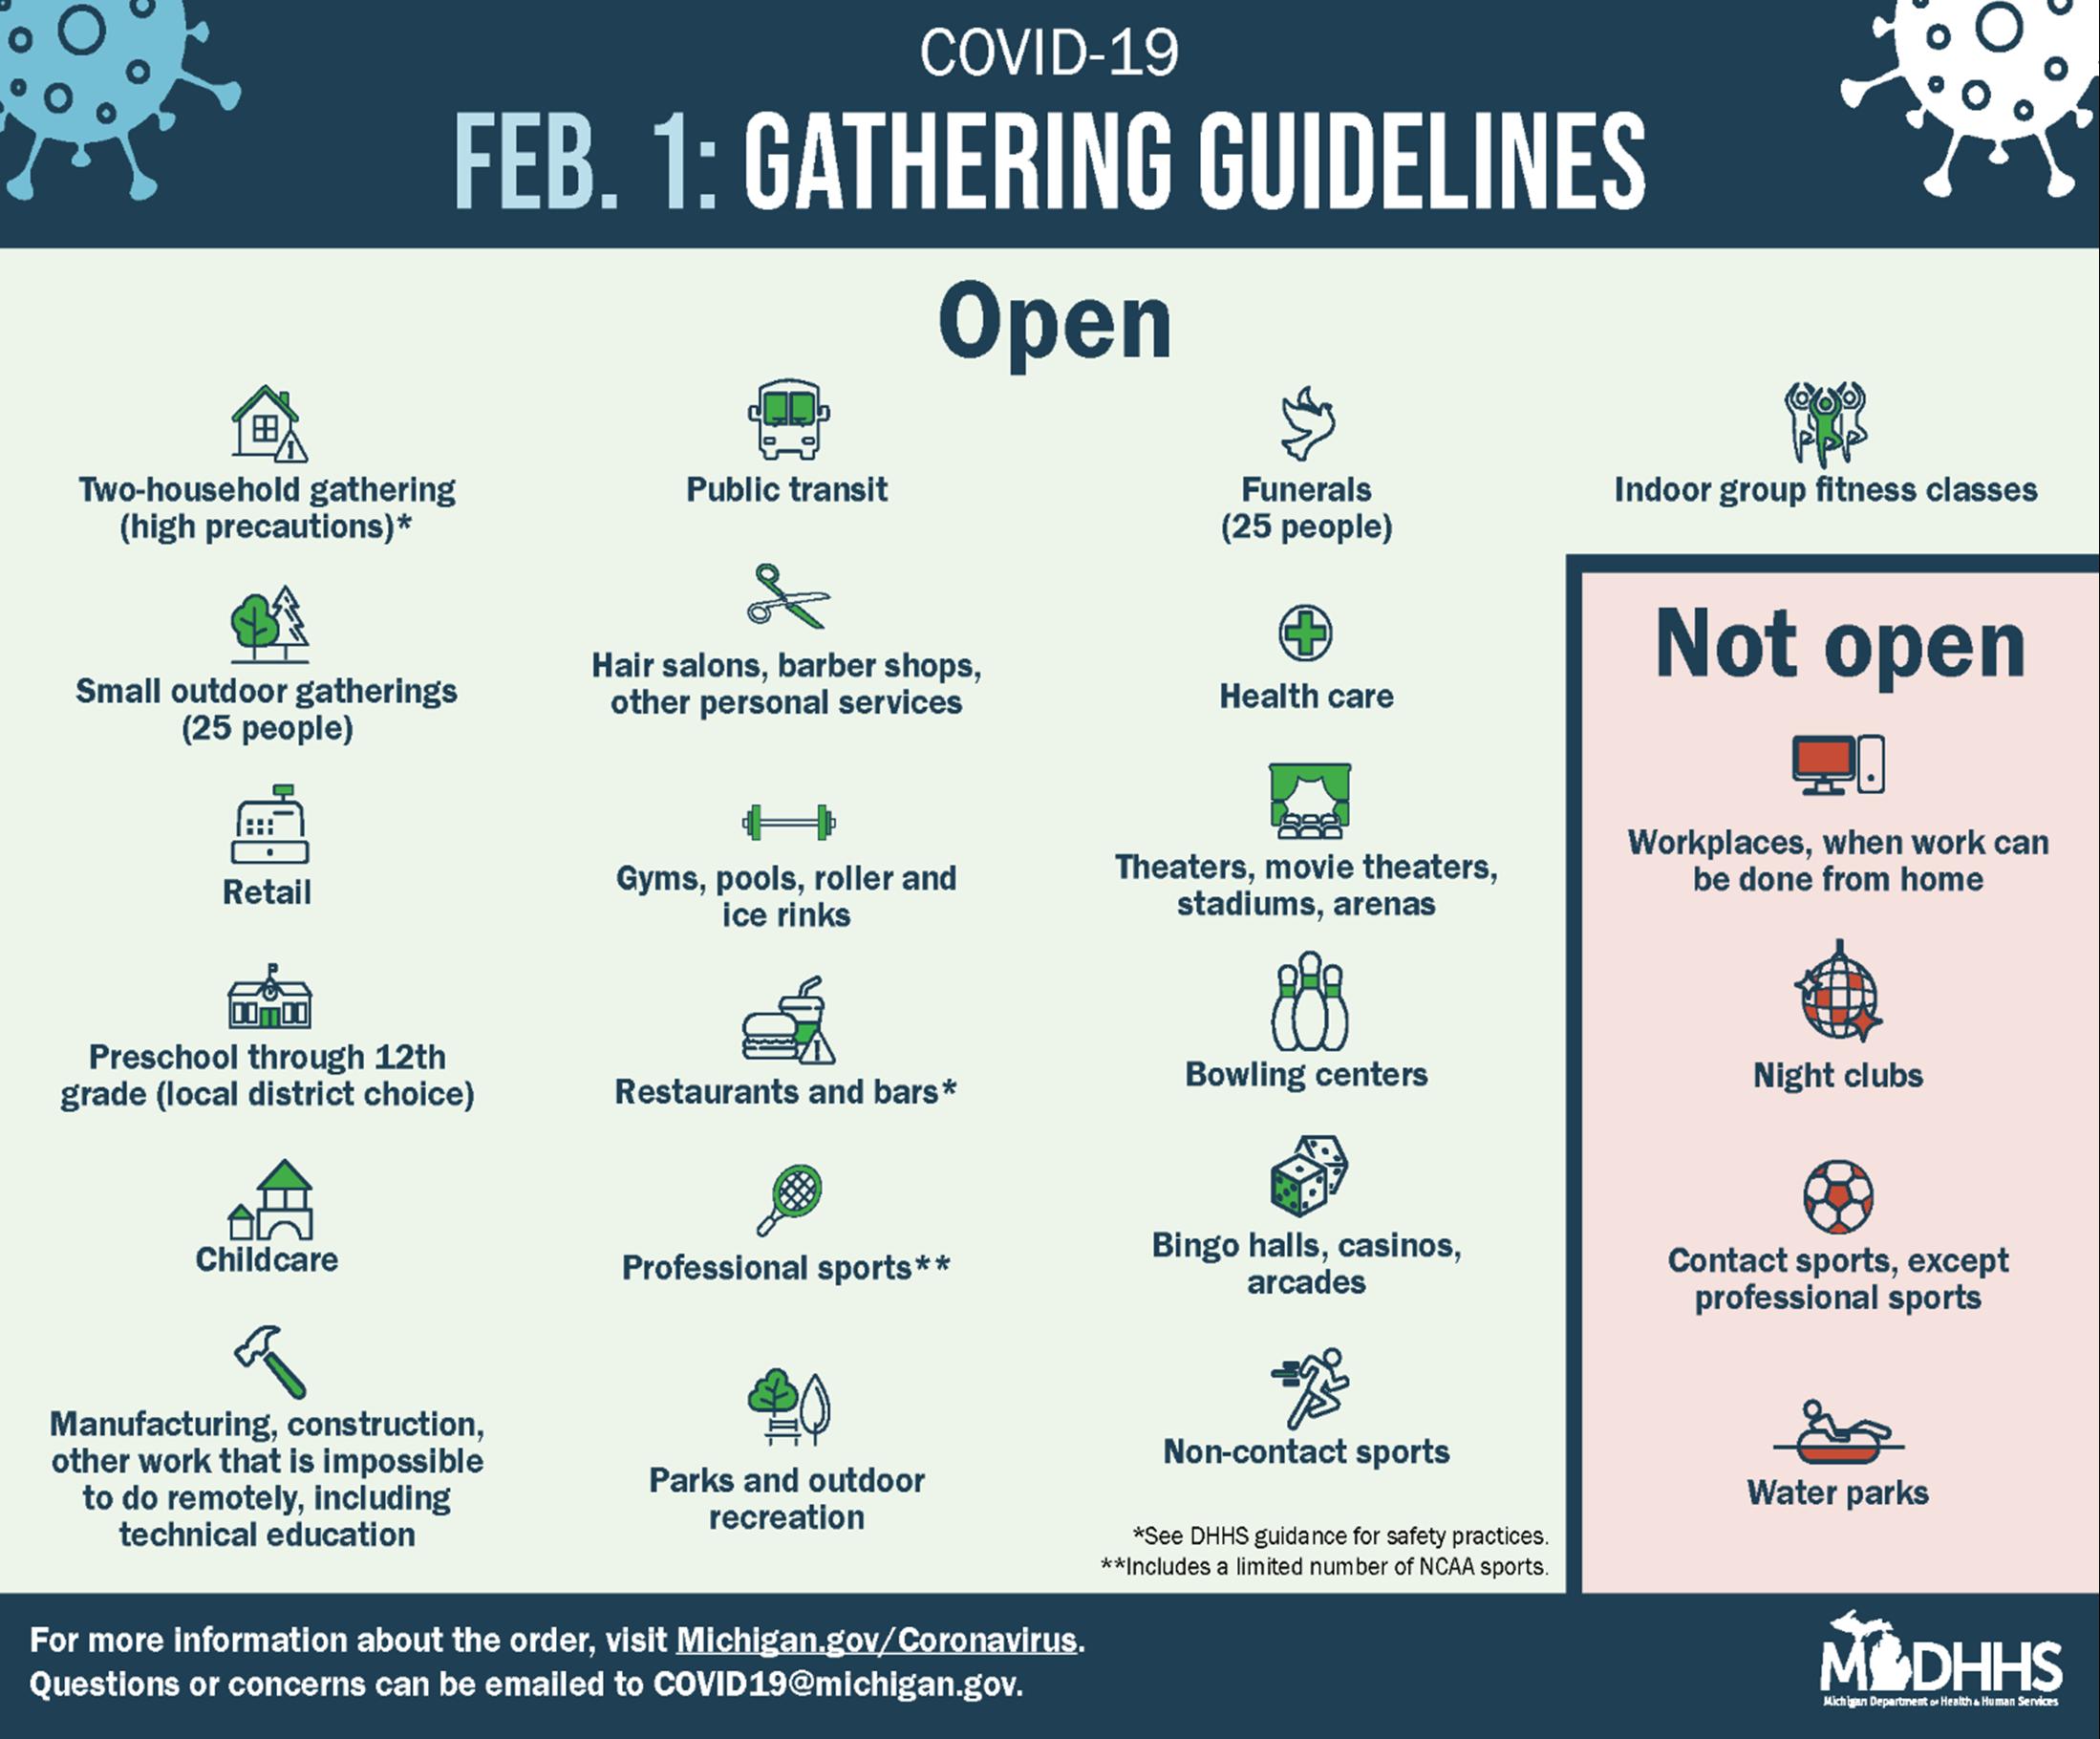 February 1 Gathering Guidelines